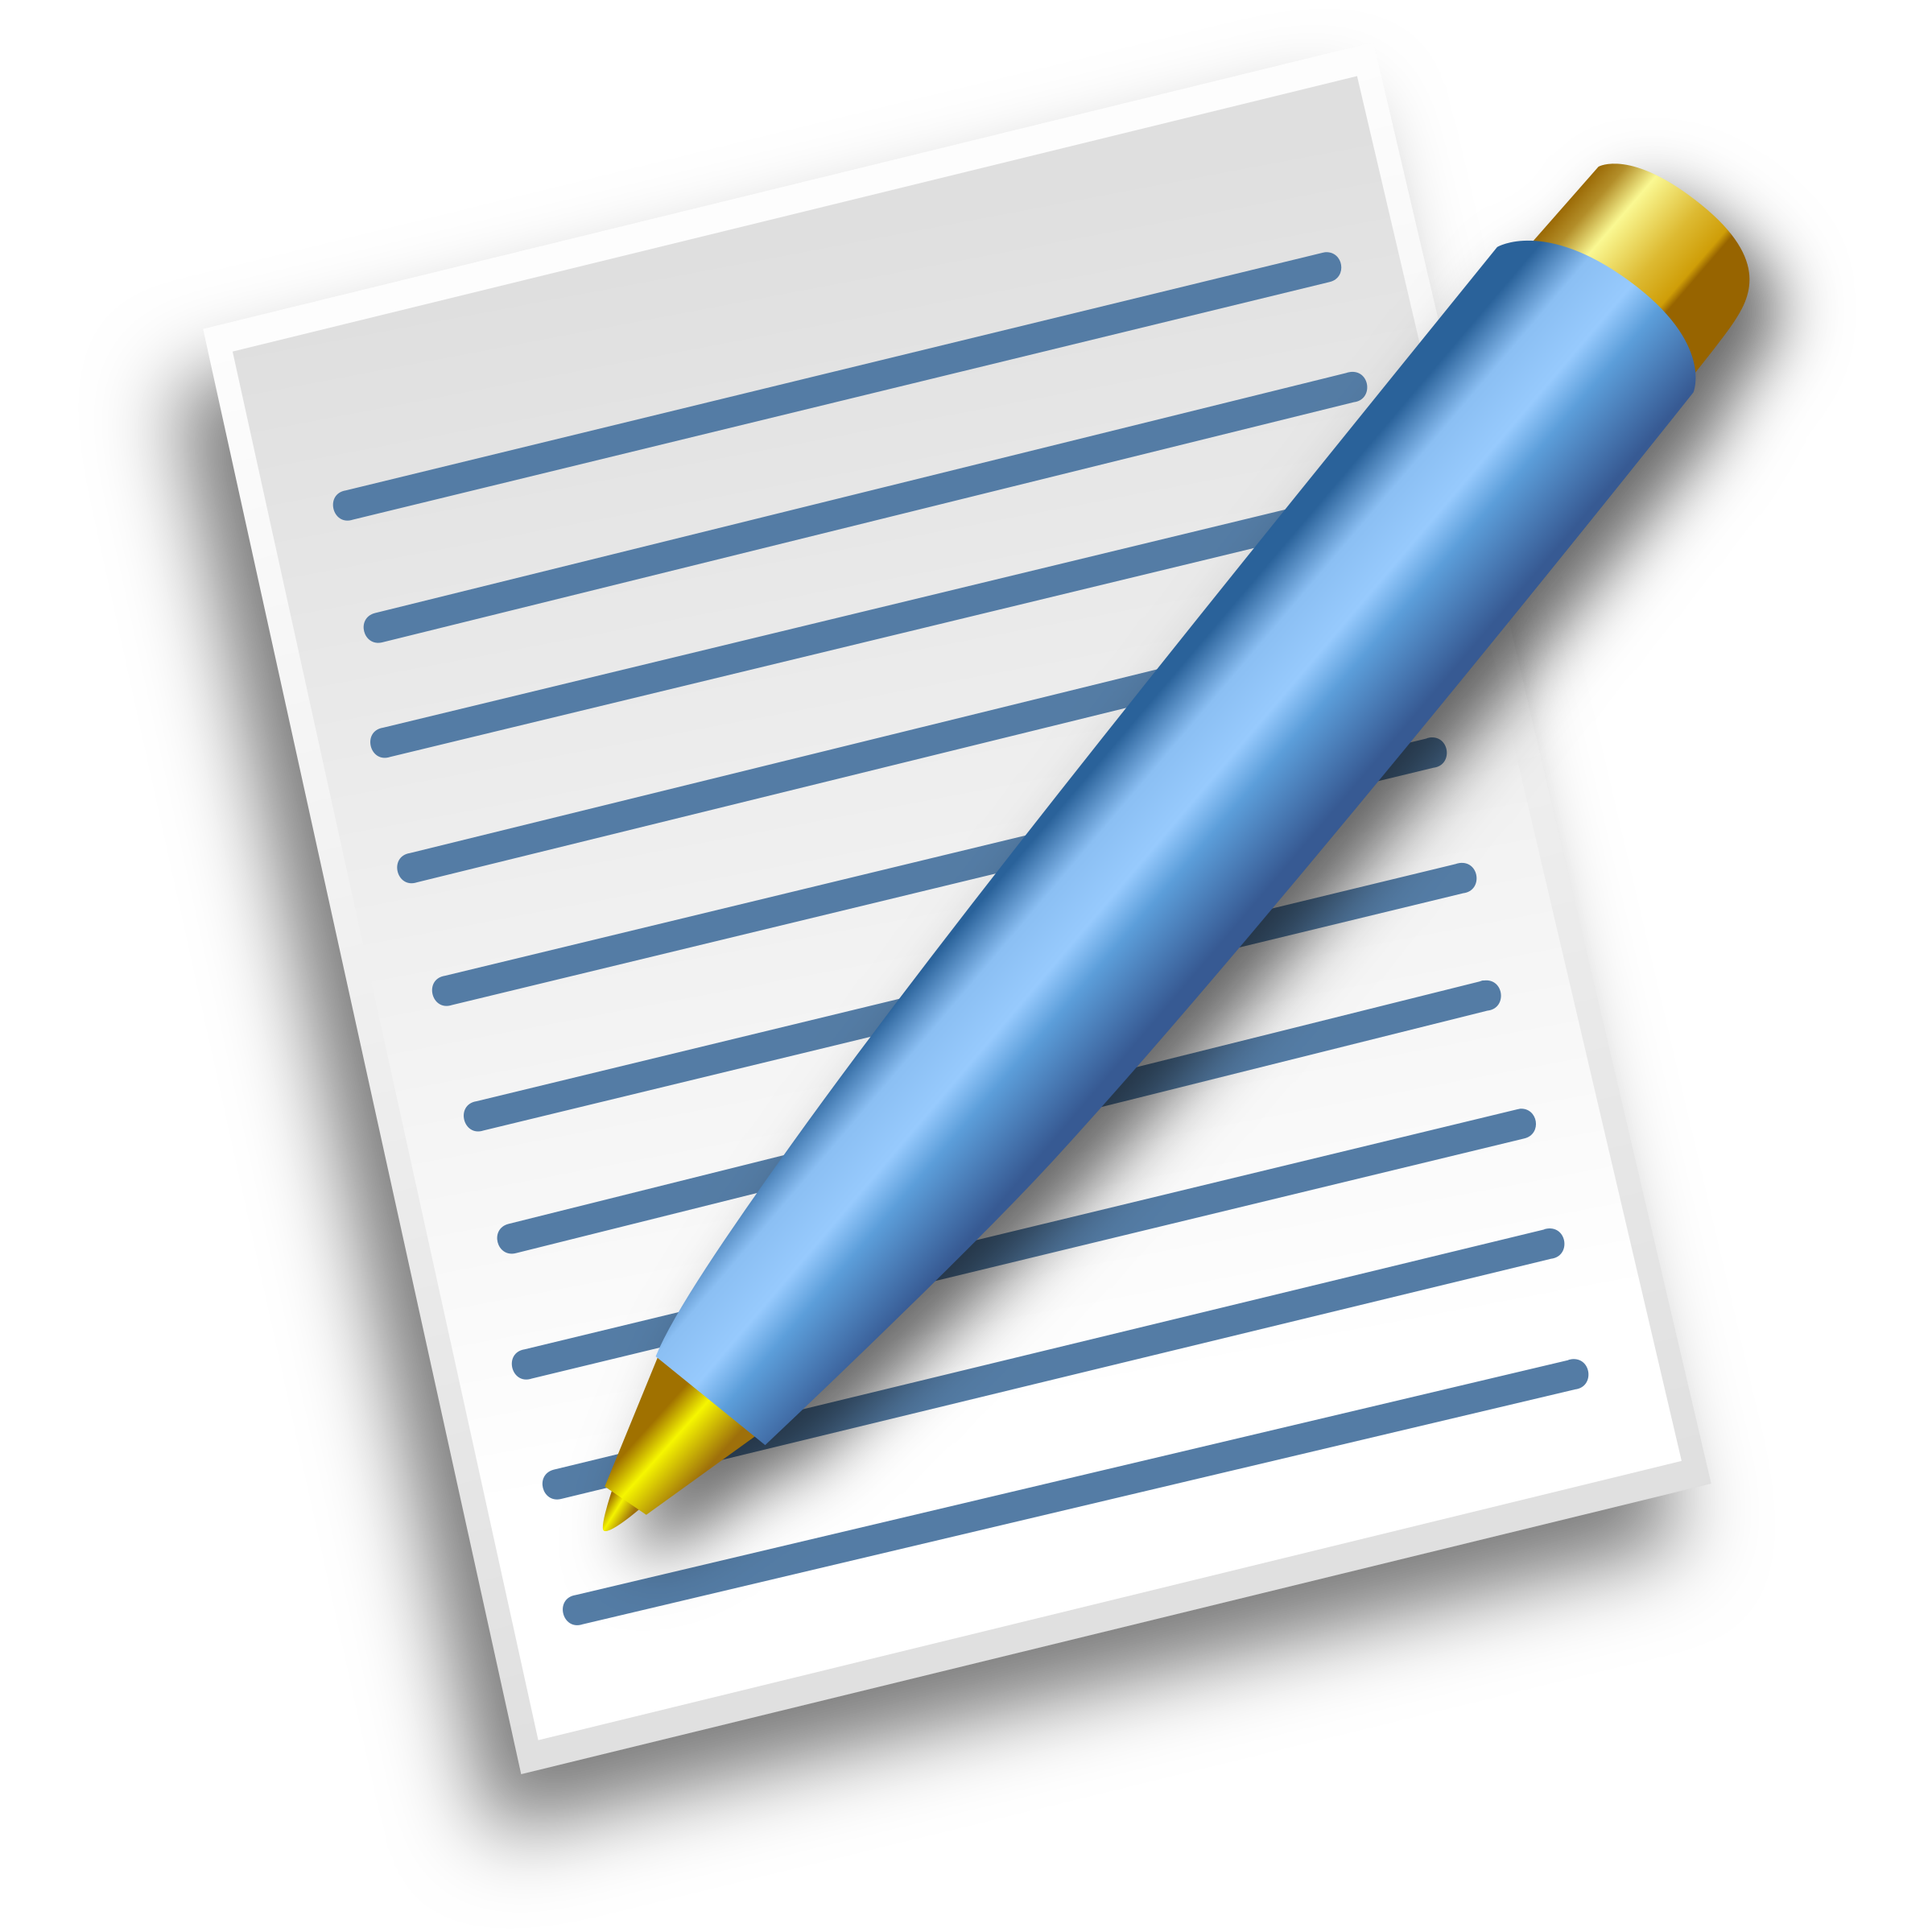 Pen Writing Paper Clipart.